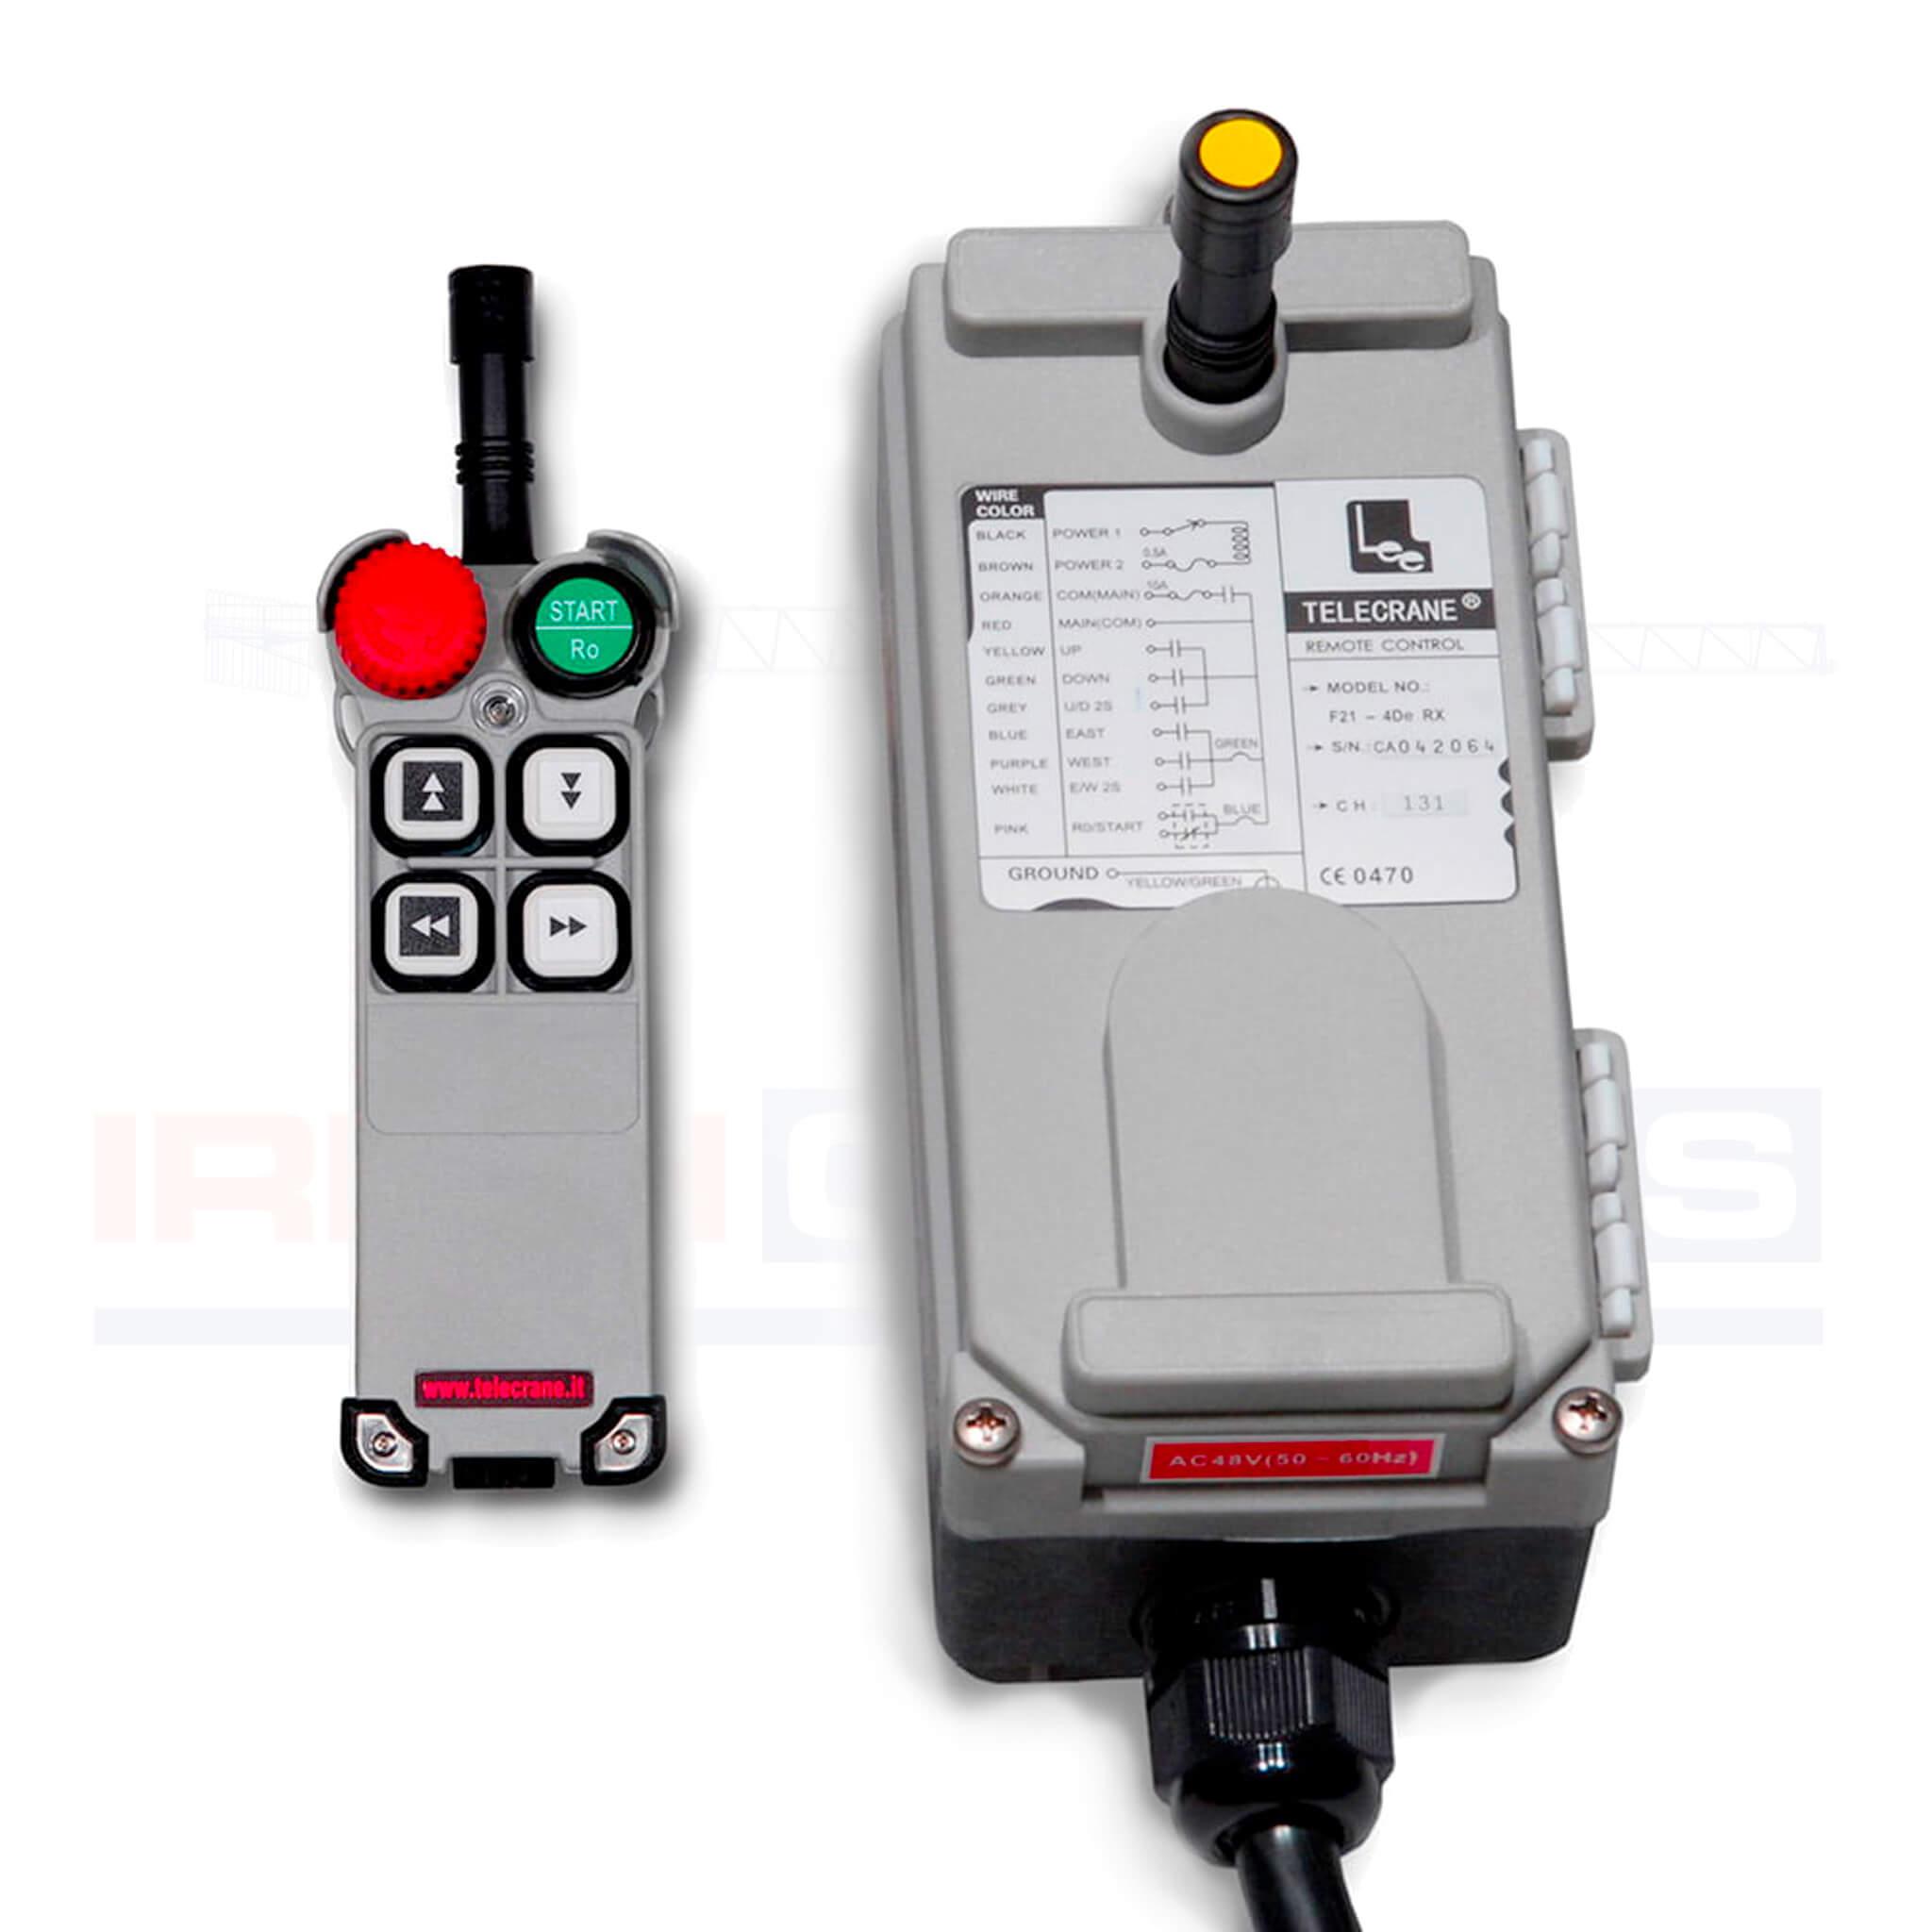 Silver Hoist F21 4D remote control